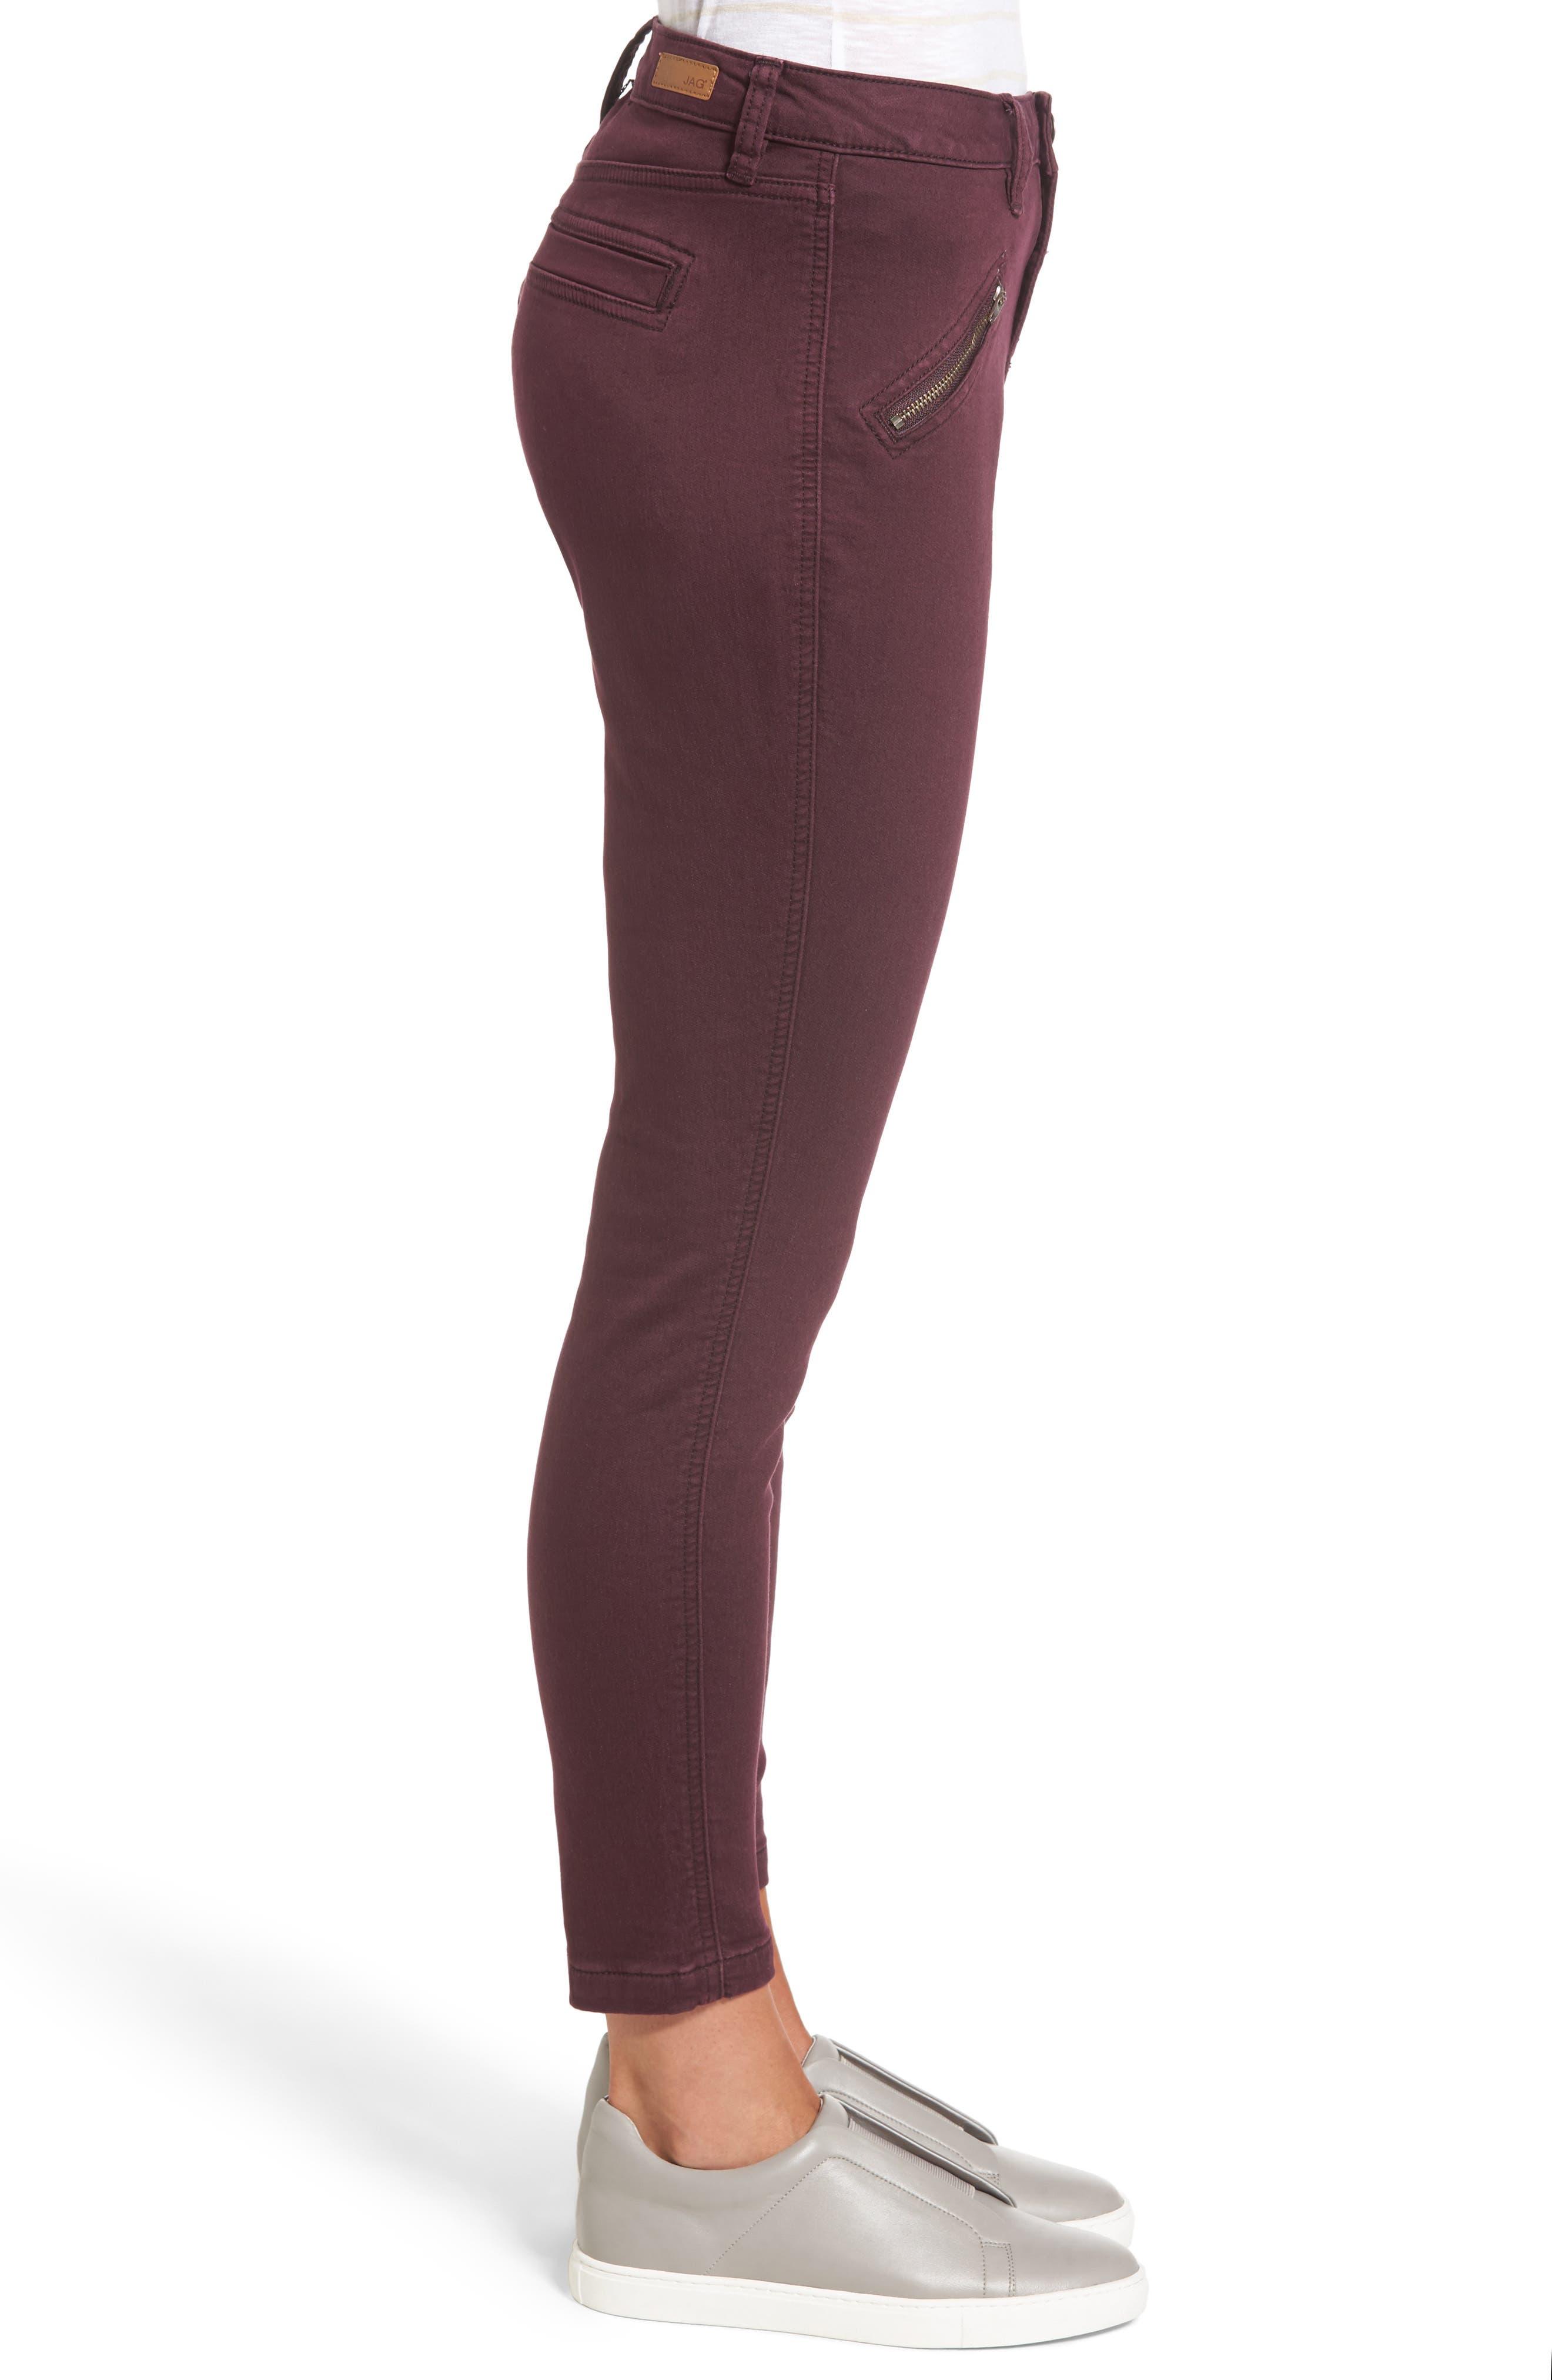 Ryan Knit Skinny Jeans,                             Alternate thumbnail 3, color,                             575